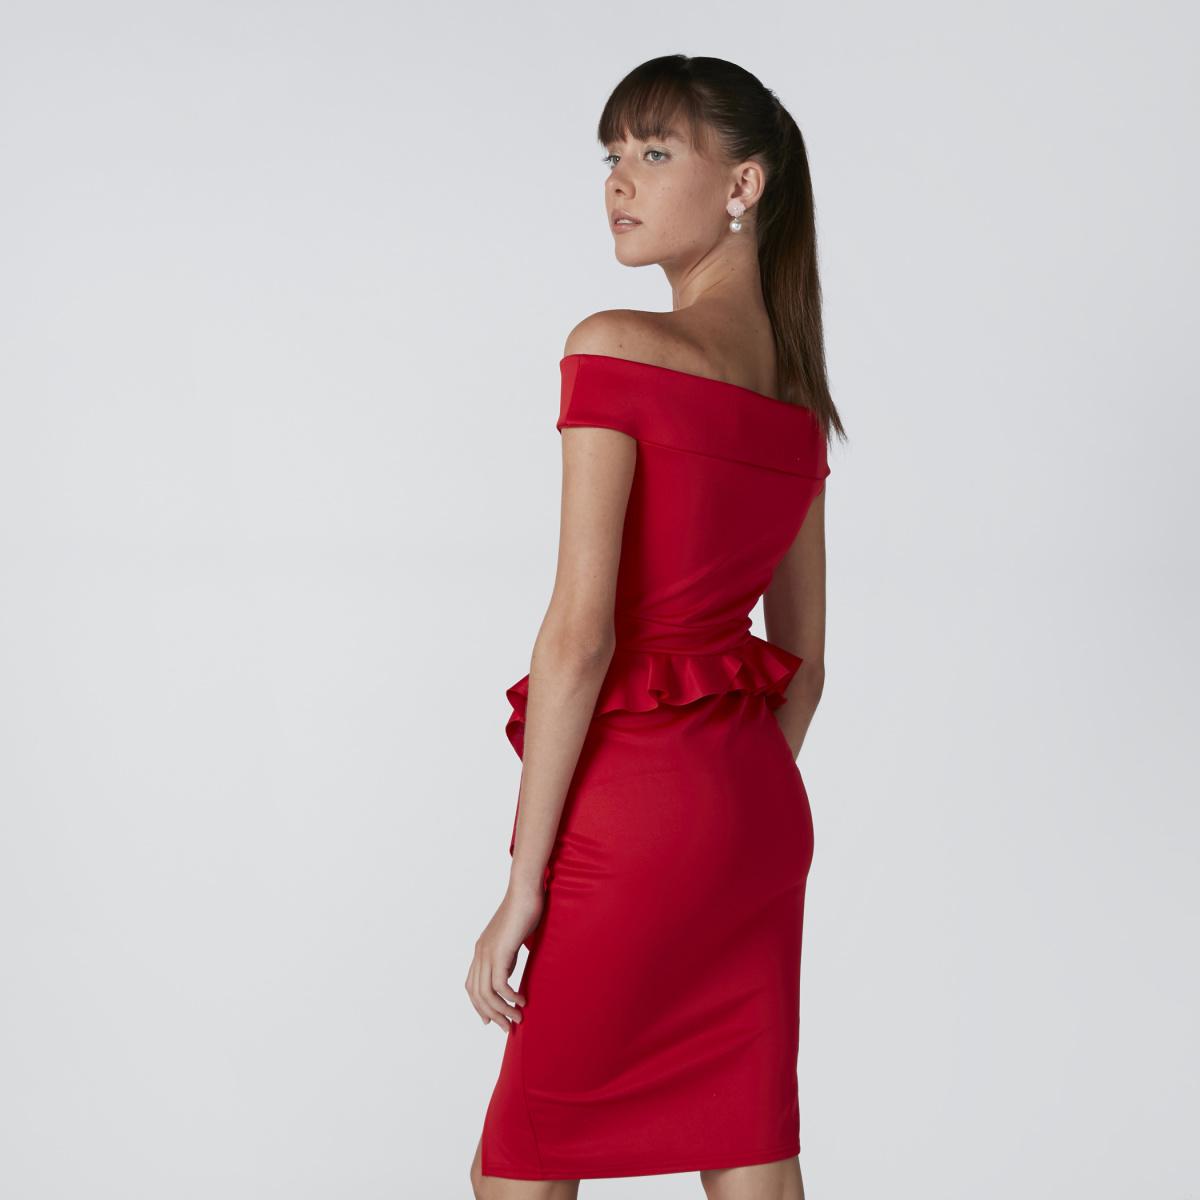 Woman in red off-shoulder peplum dress